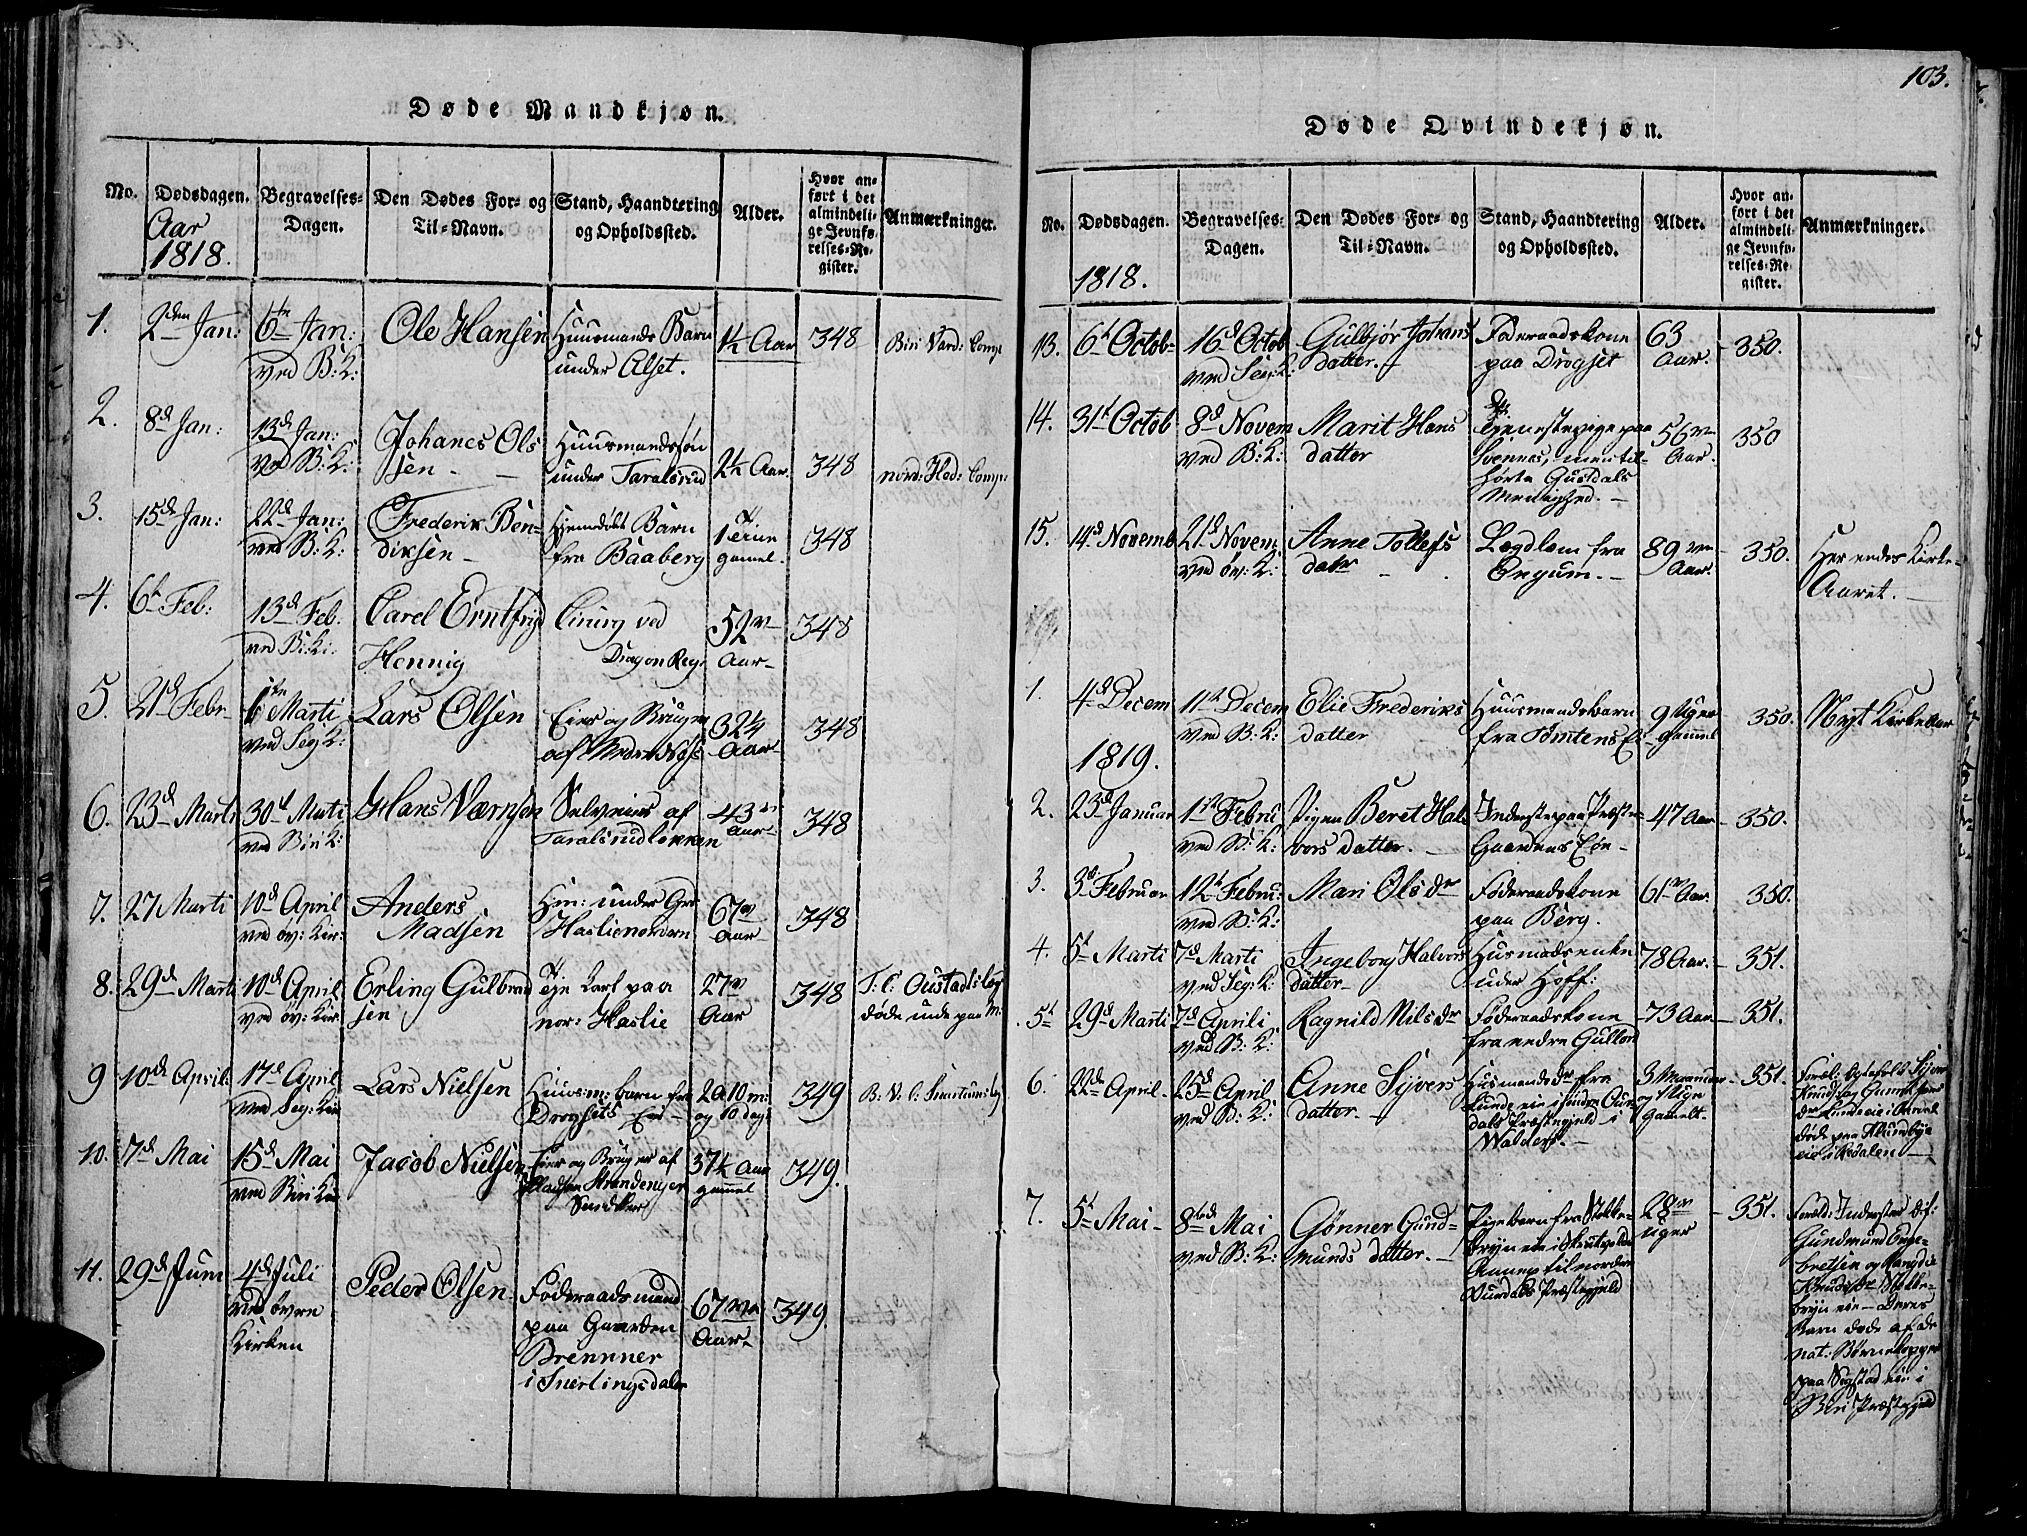 SAH, Biri prestekontor, Ministerialbok nr. 3, 1814-1828, s. 103